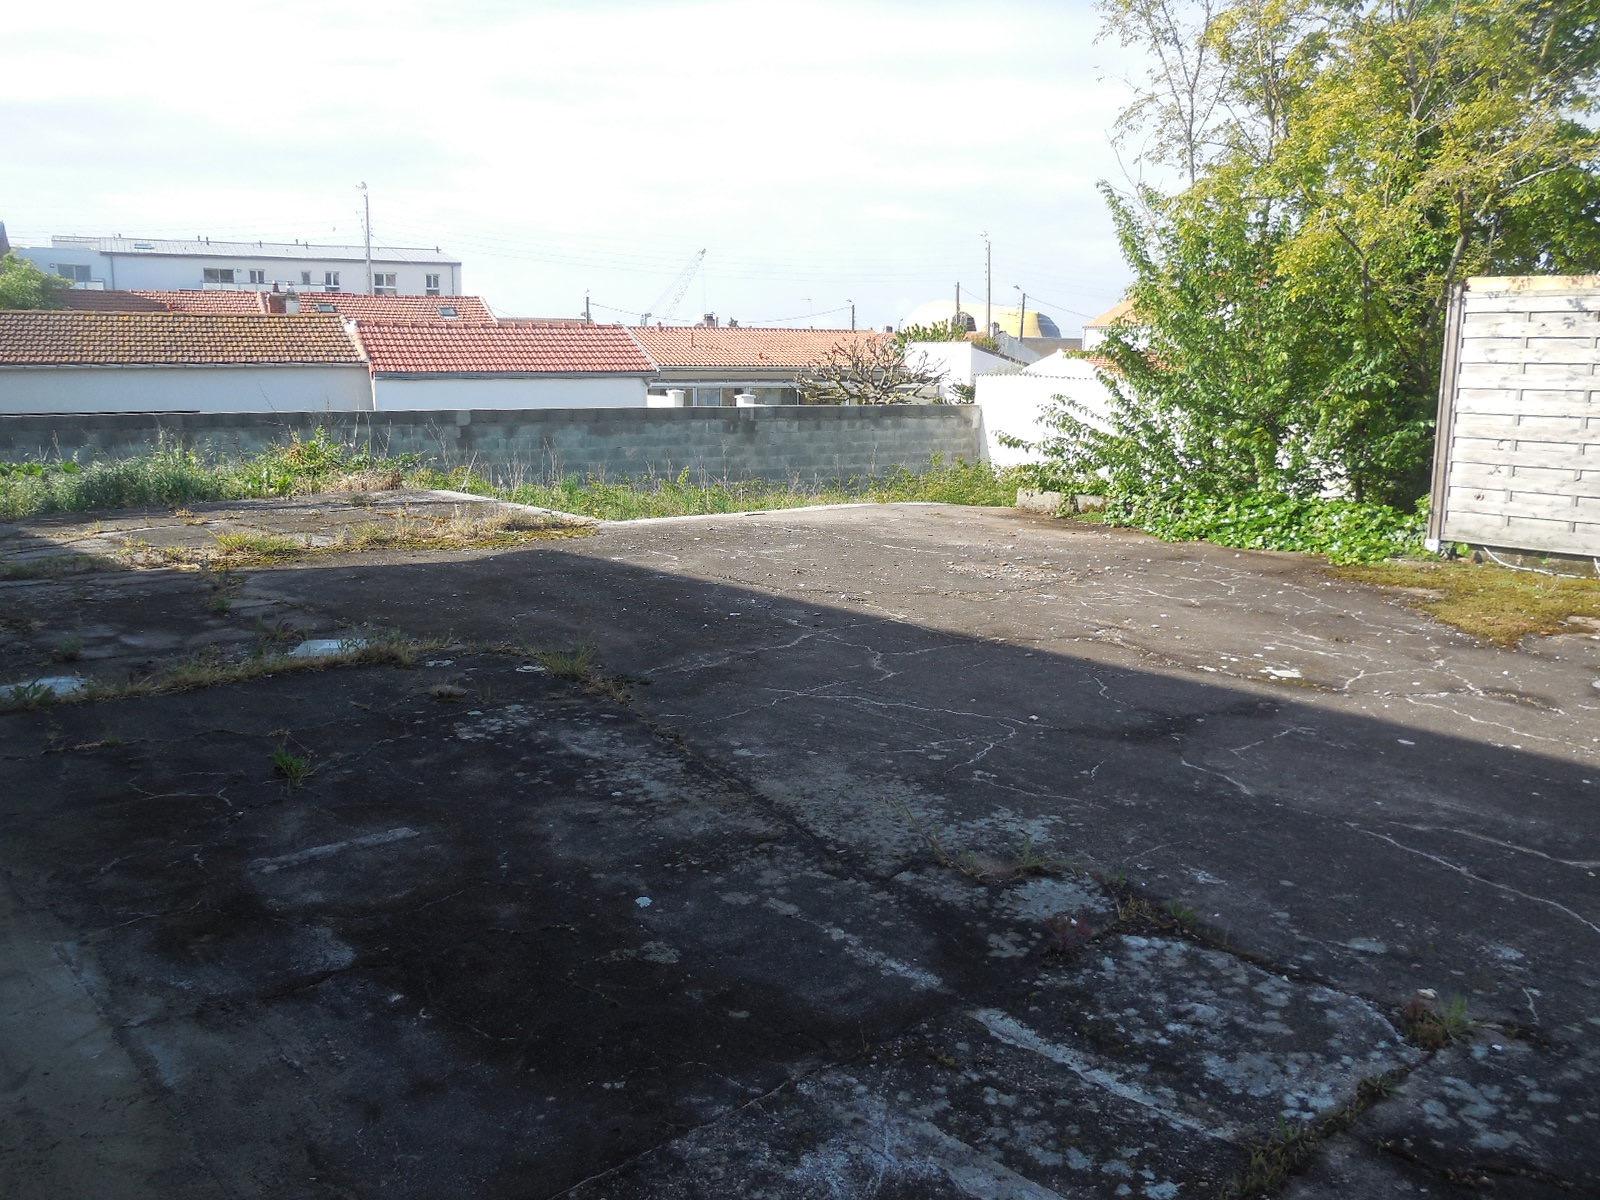 immeuble la rochelle LA ROCHELLE - LA PALLICE - FONCIER